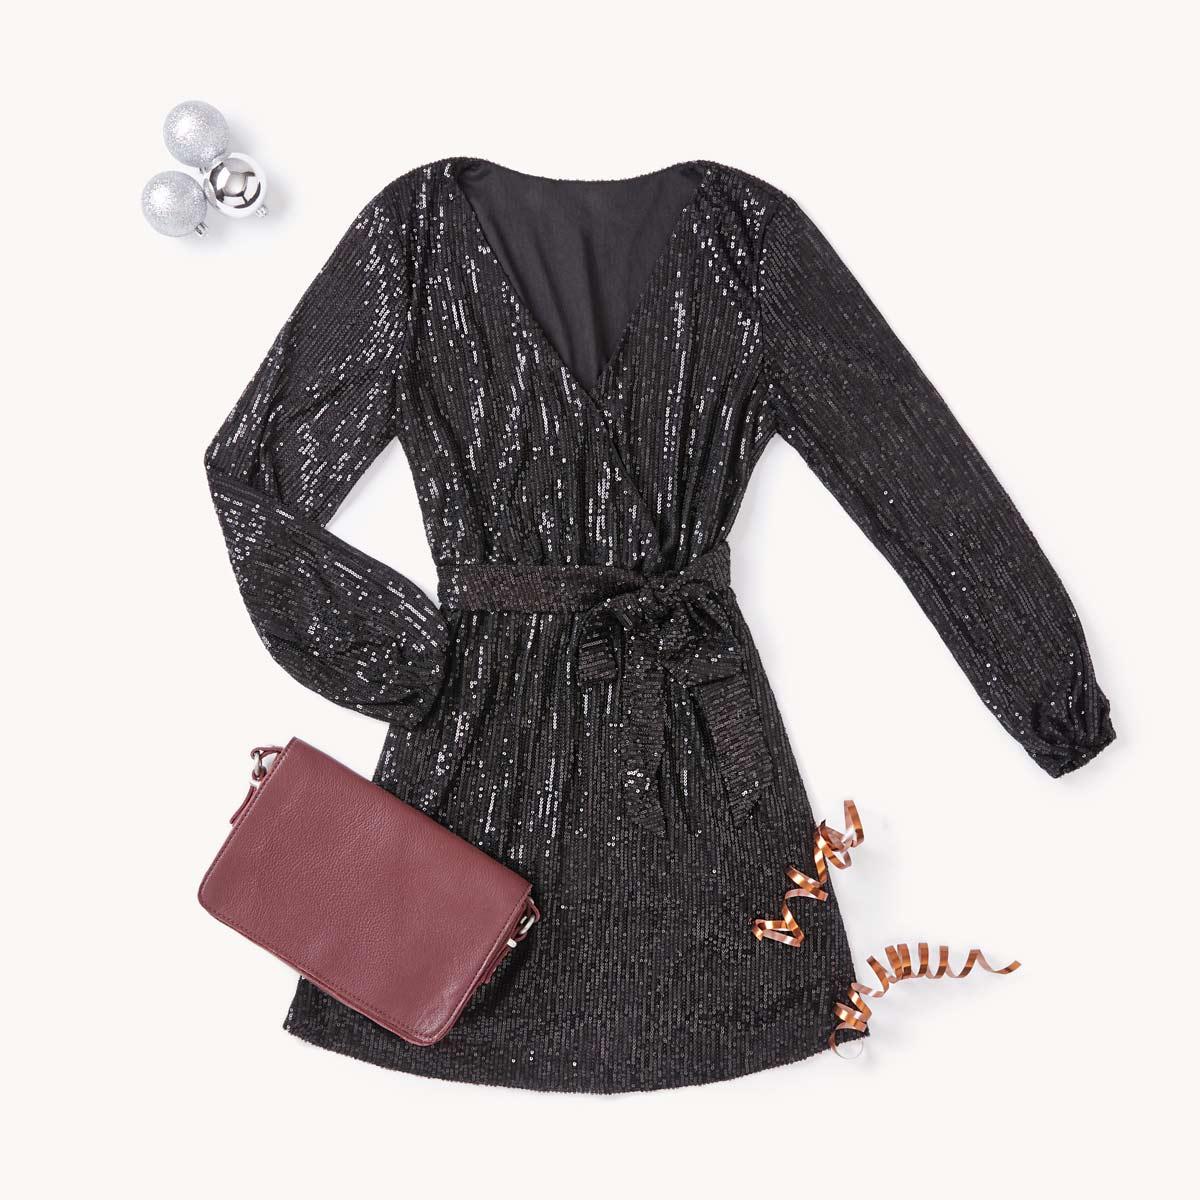 LBD (Little Black Dress)  en version shiny